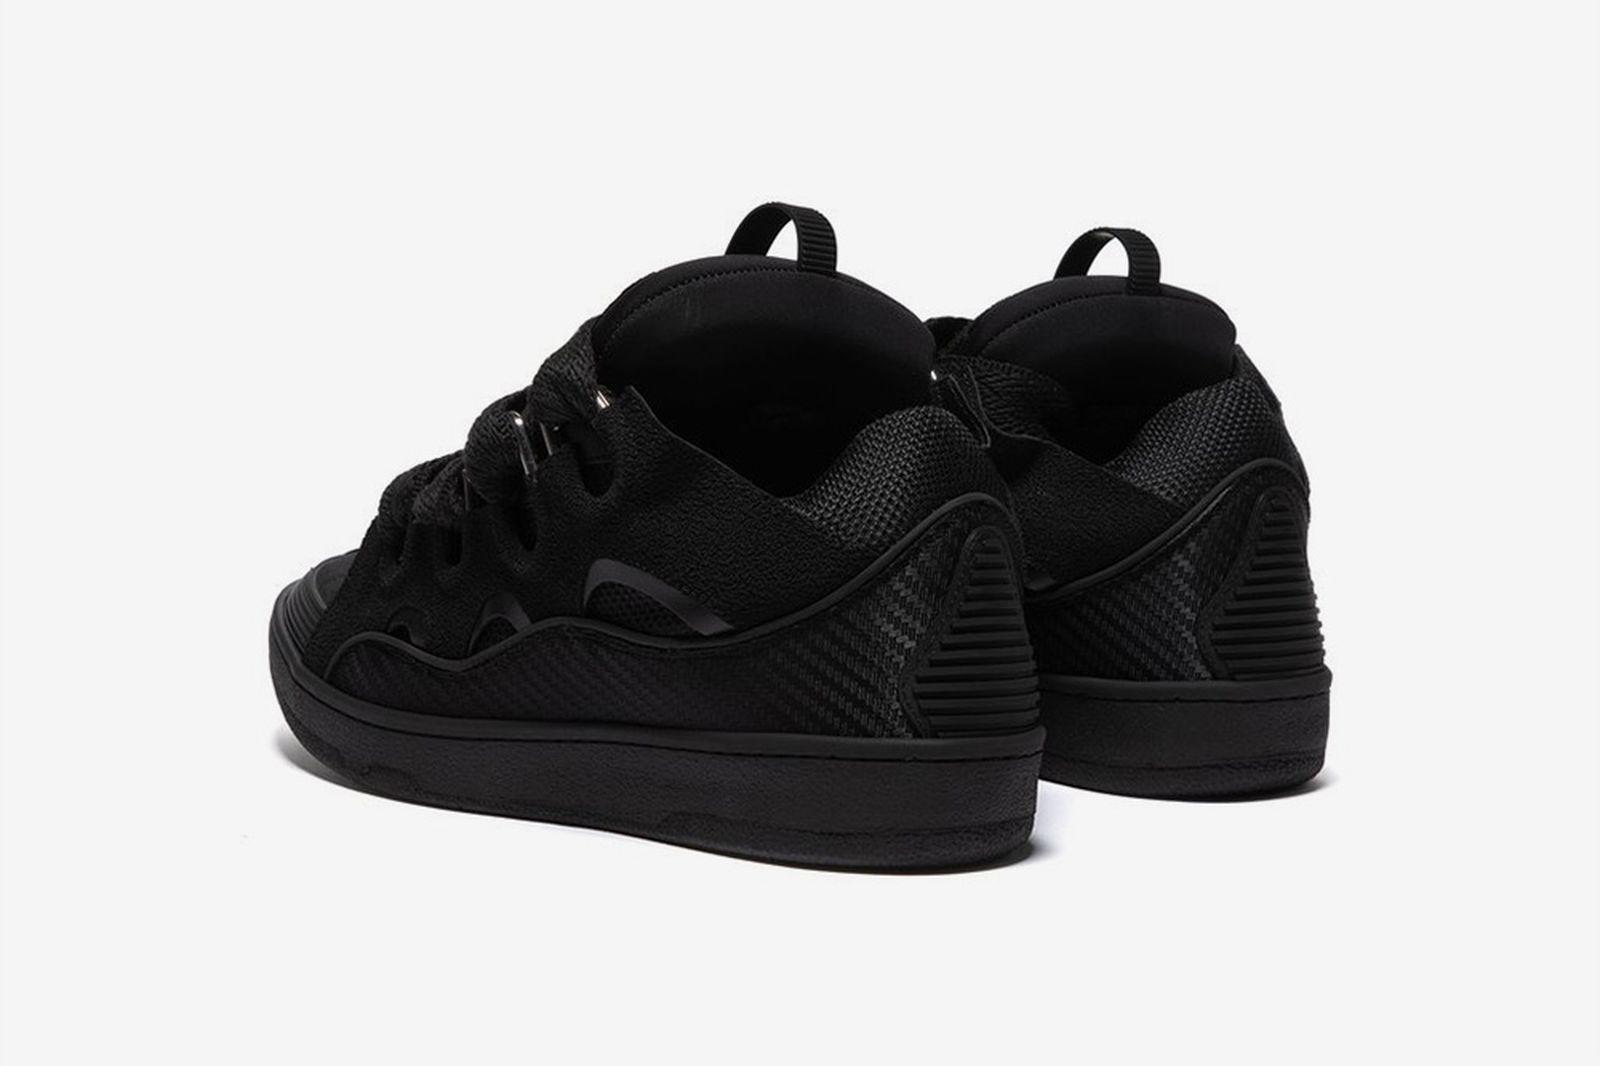 lanvin-curb-all-black-release-date-price-04